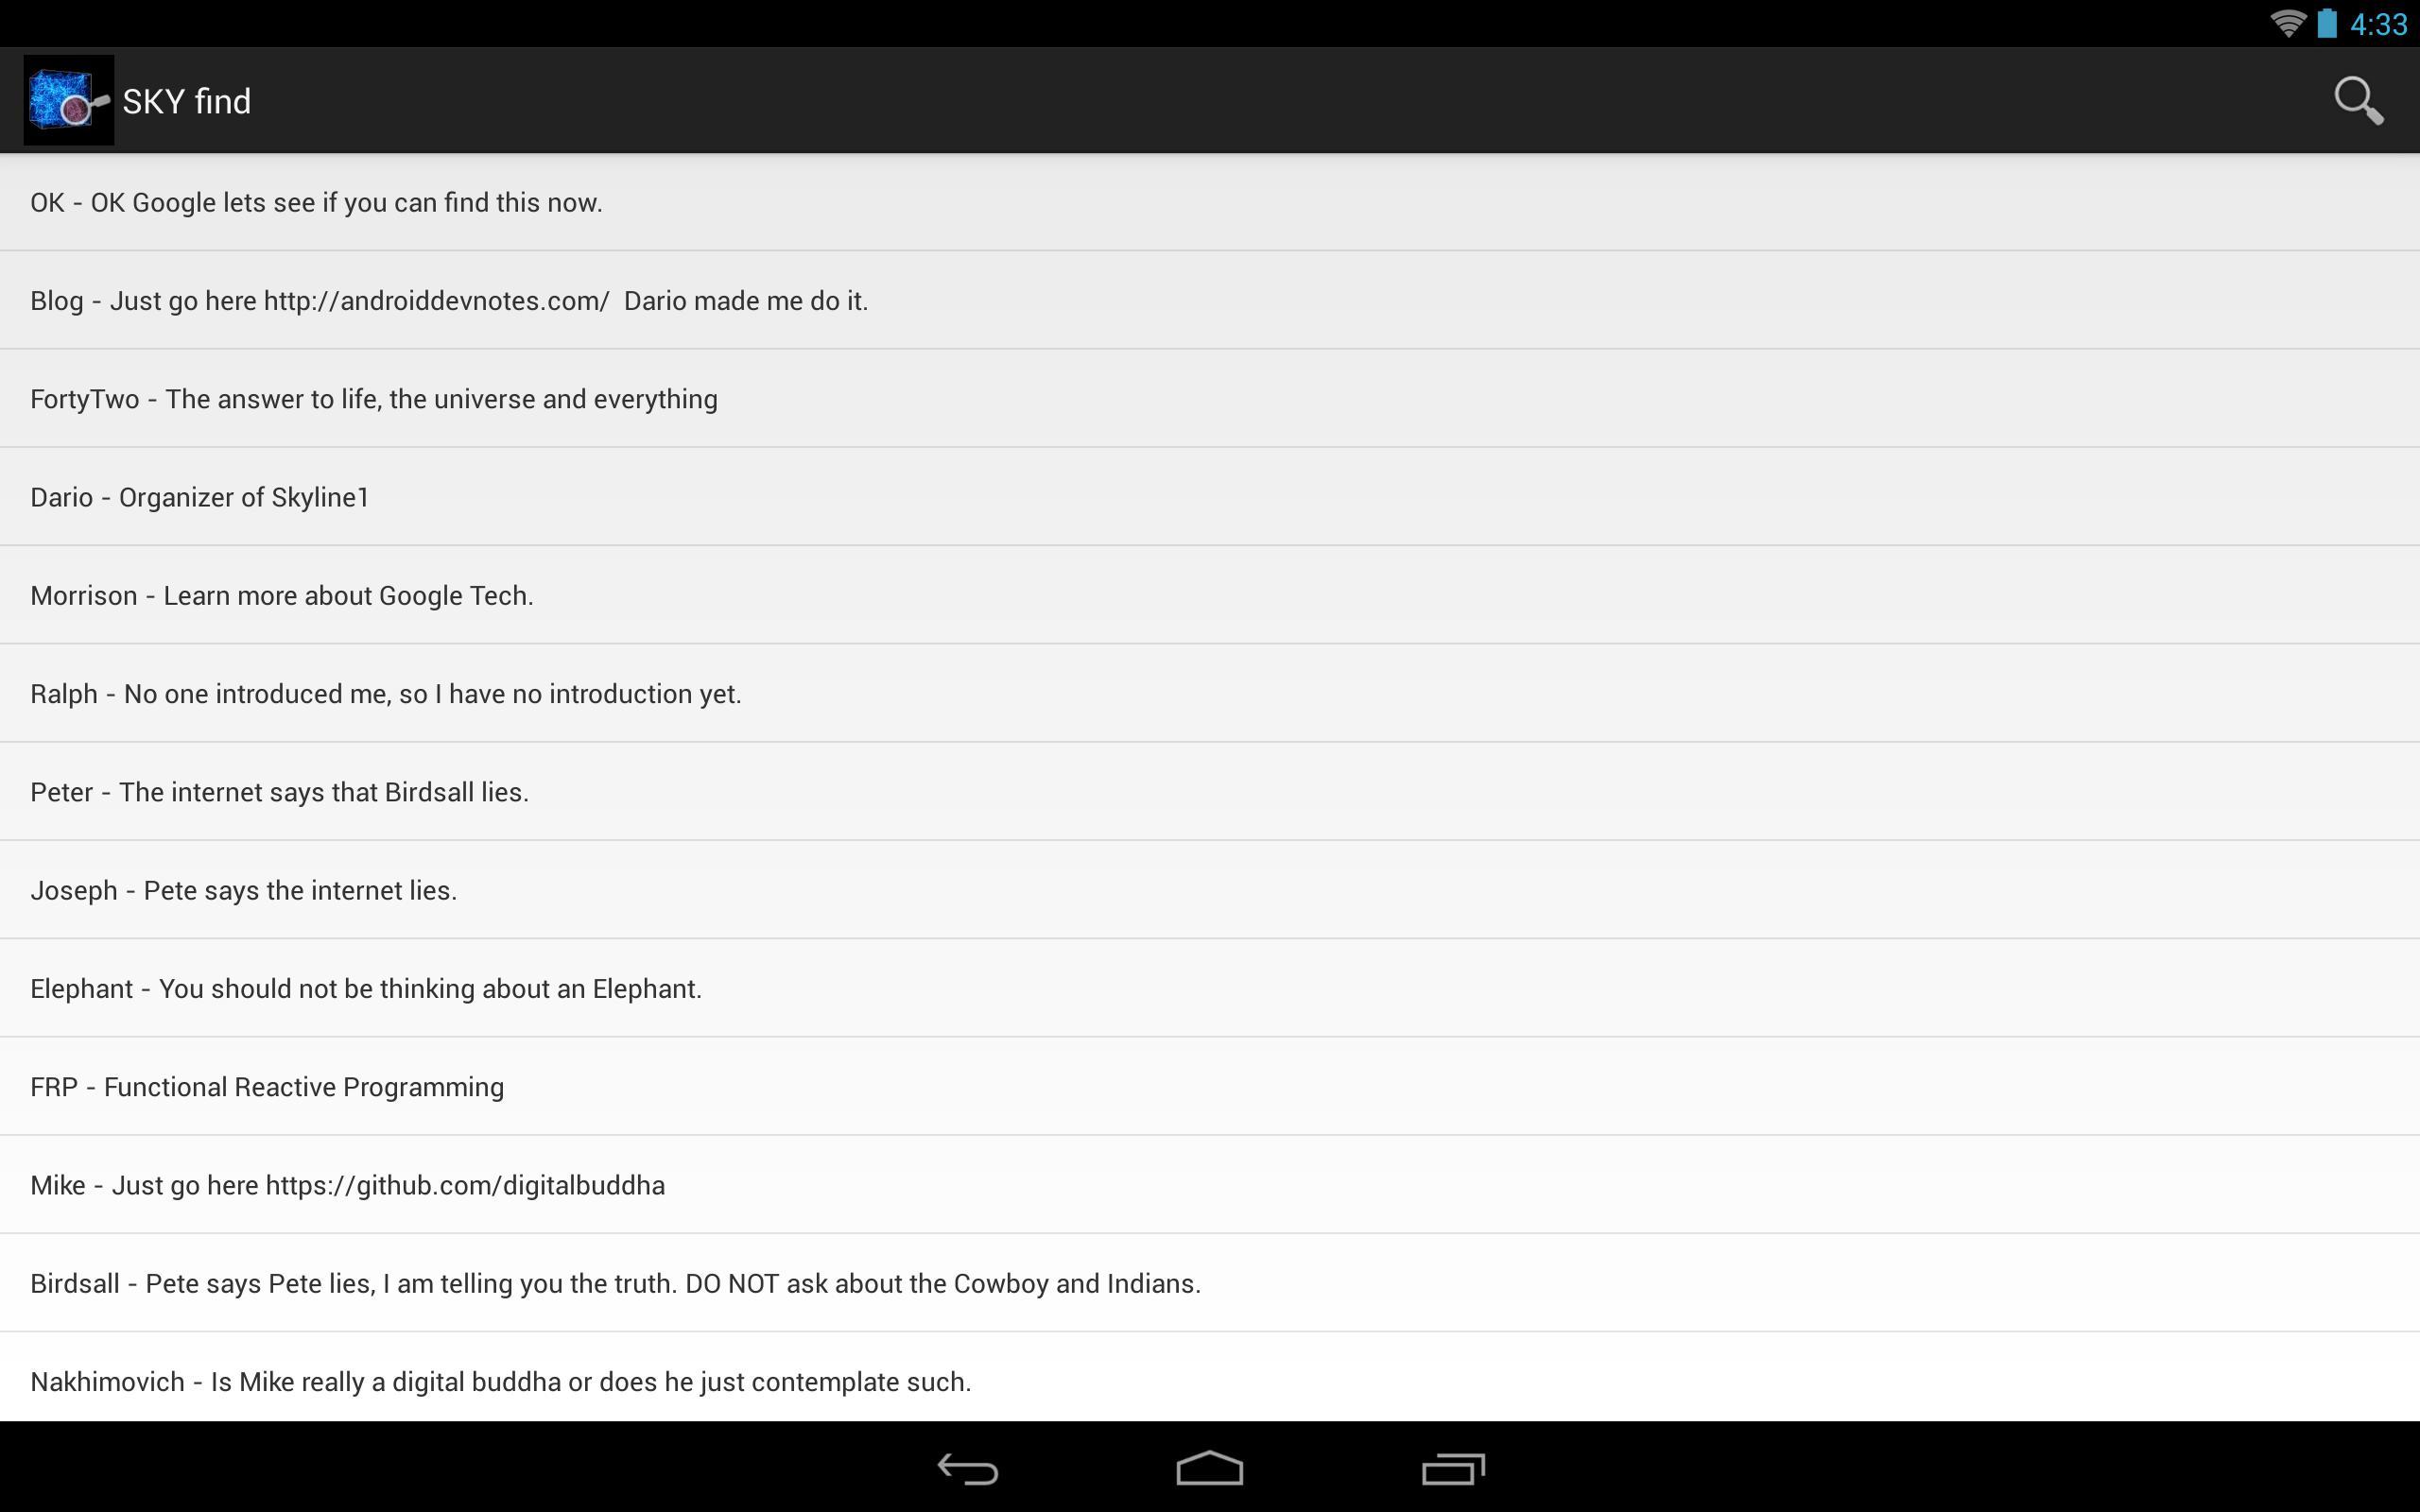 Sky find - Test OK Google for Android - APK Download